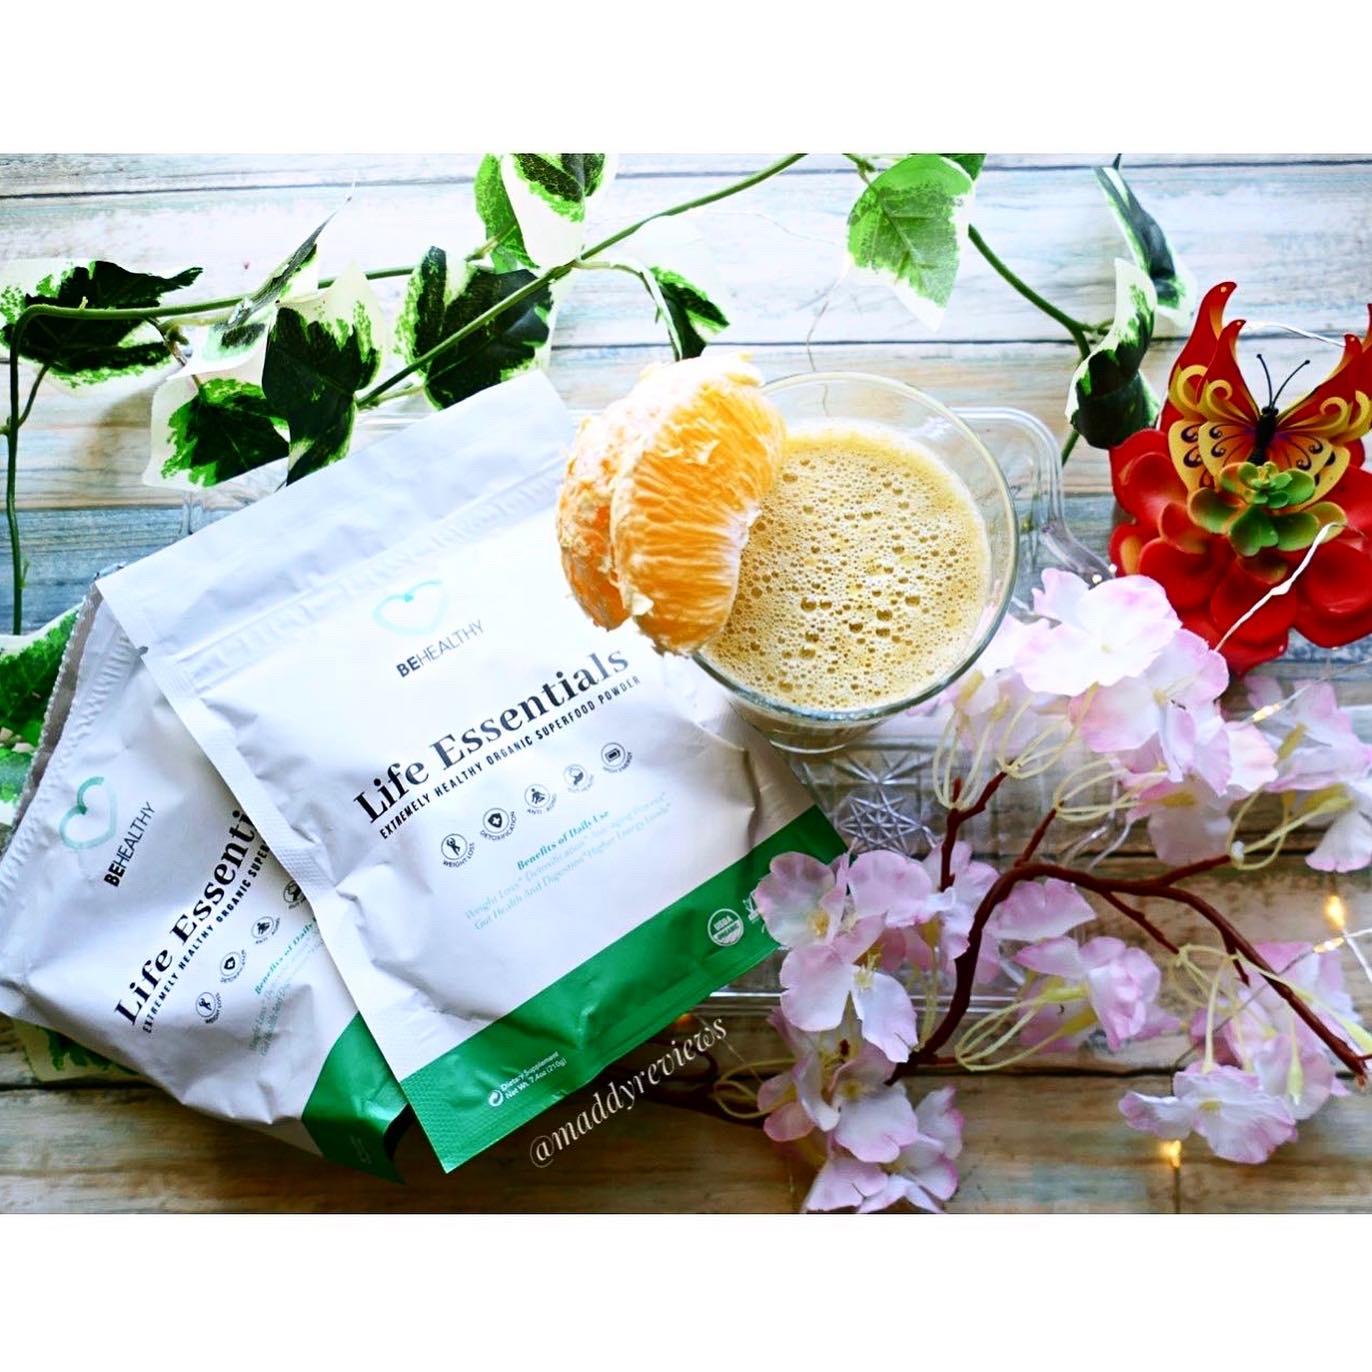 Be-Healthy-Life-Essentials-Creamsicle-Orange-Smoothie